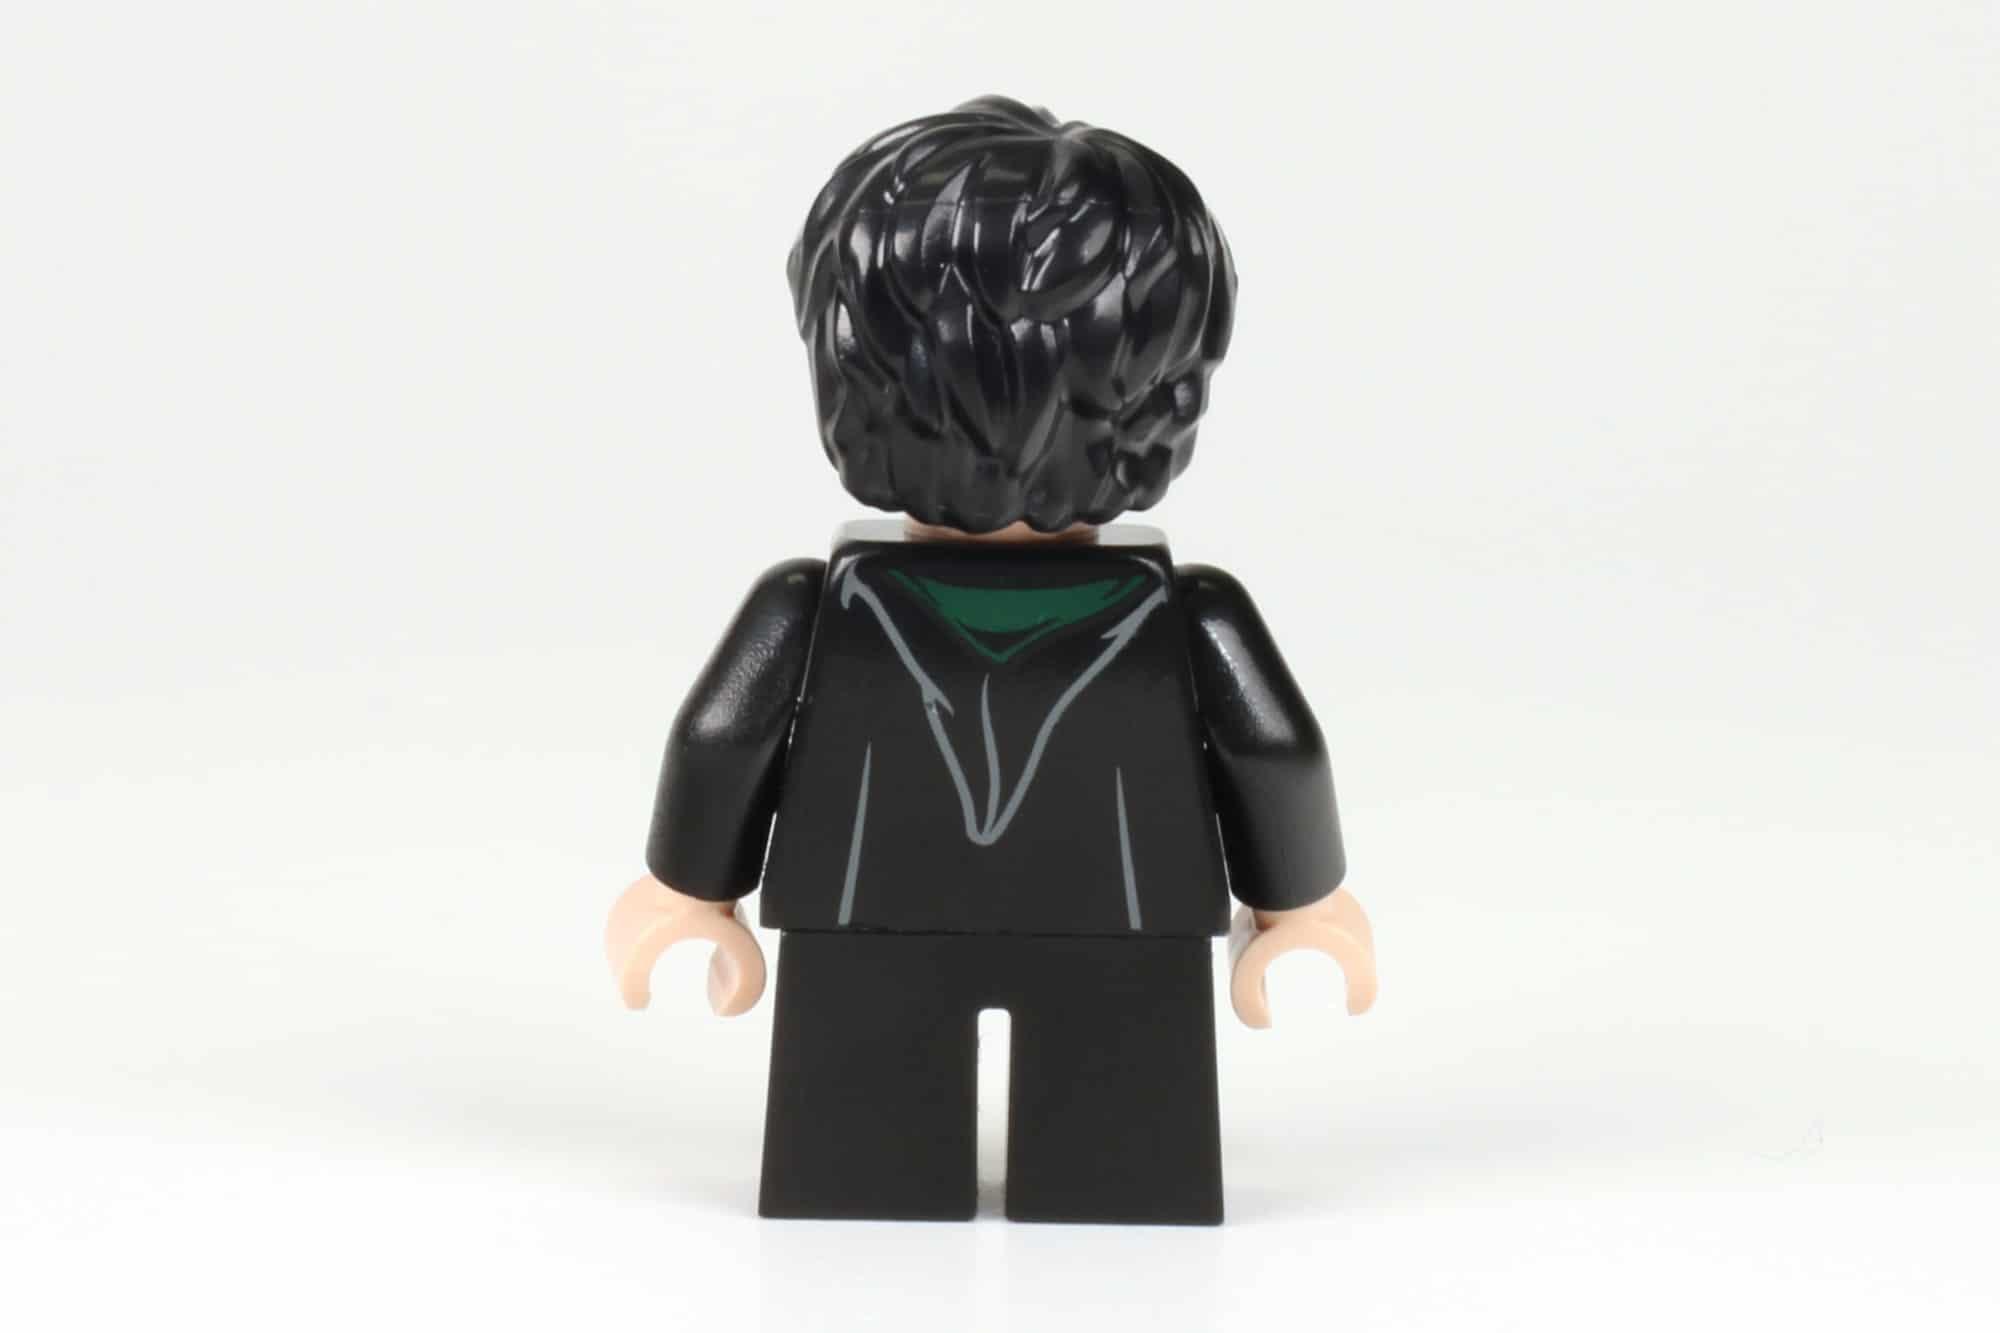 LEGO Harry Potter 76386 Hogwarts Misslungener Vielsafttrank Minifiguren 2 2